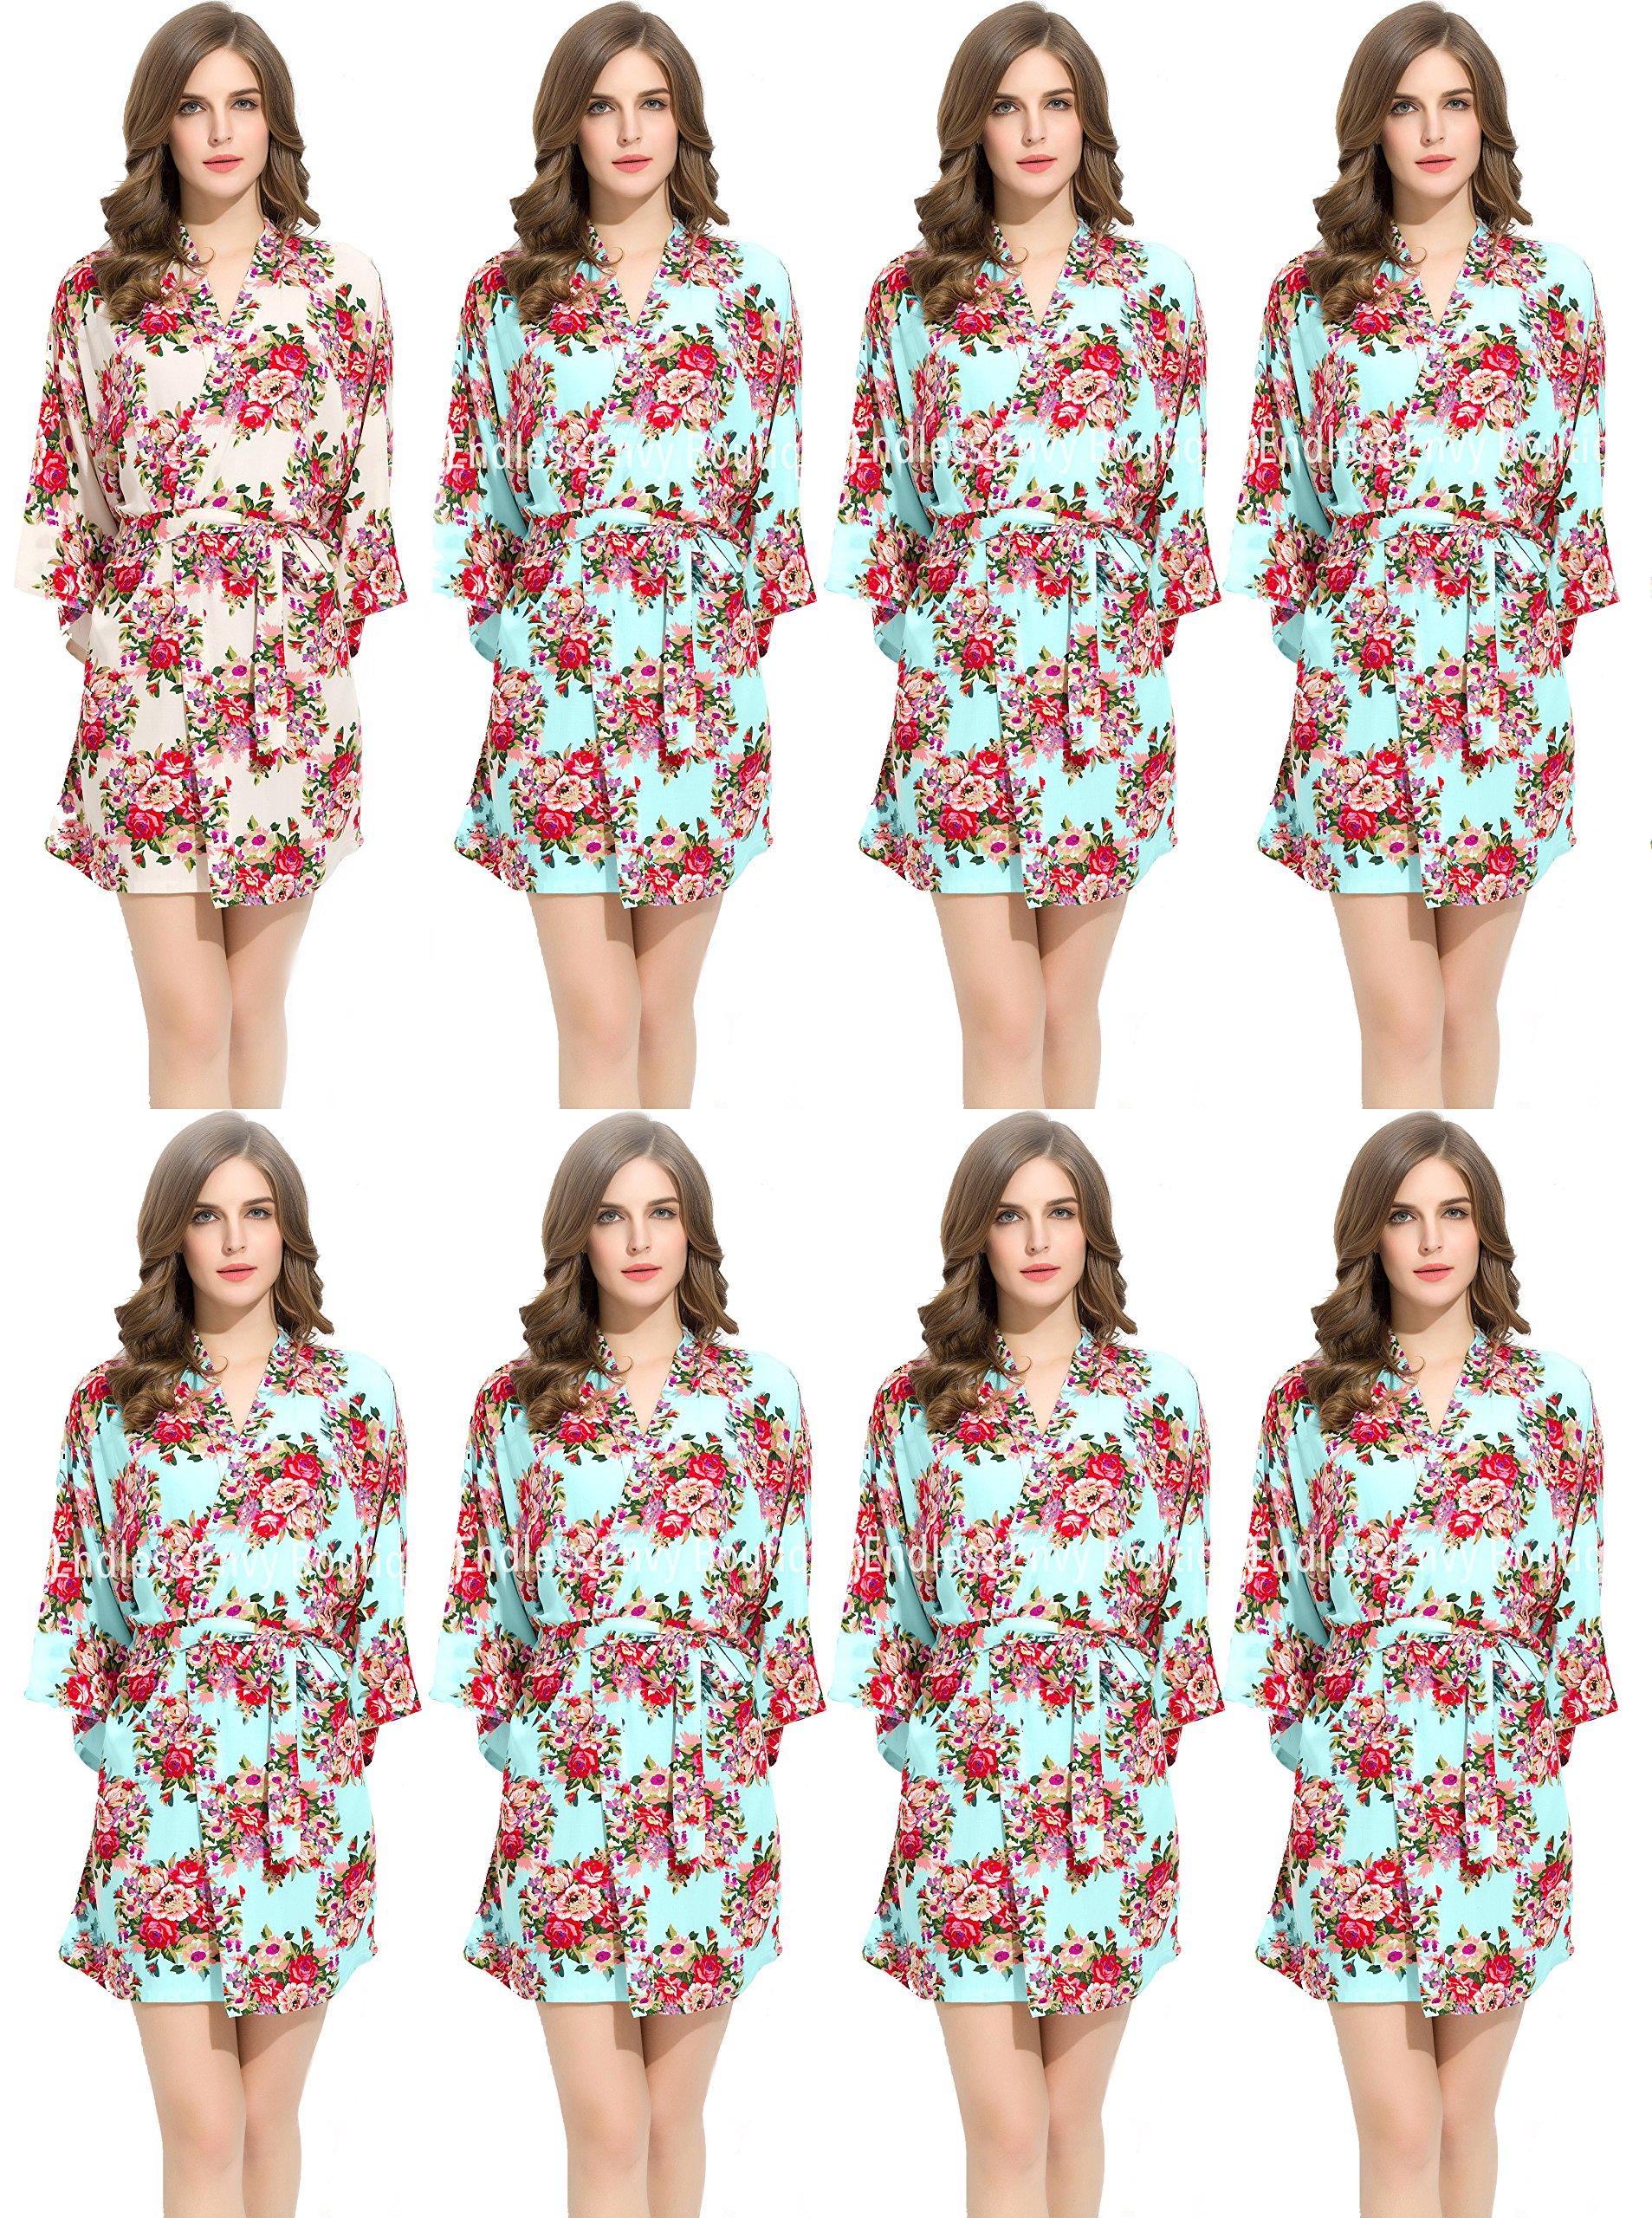 Floral Cotton Bridesmaids Robe 7 Mint & 1 White Wedding Bride by Endless Envy